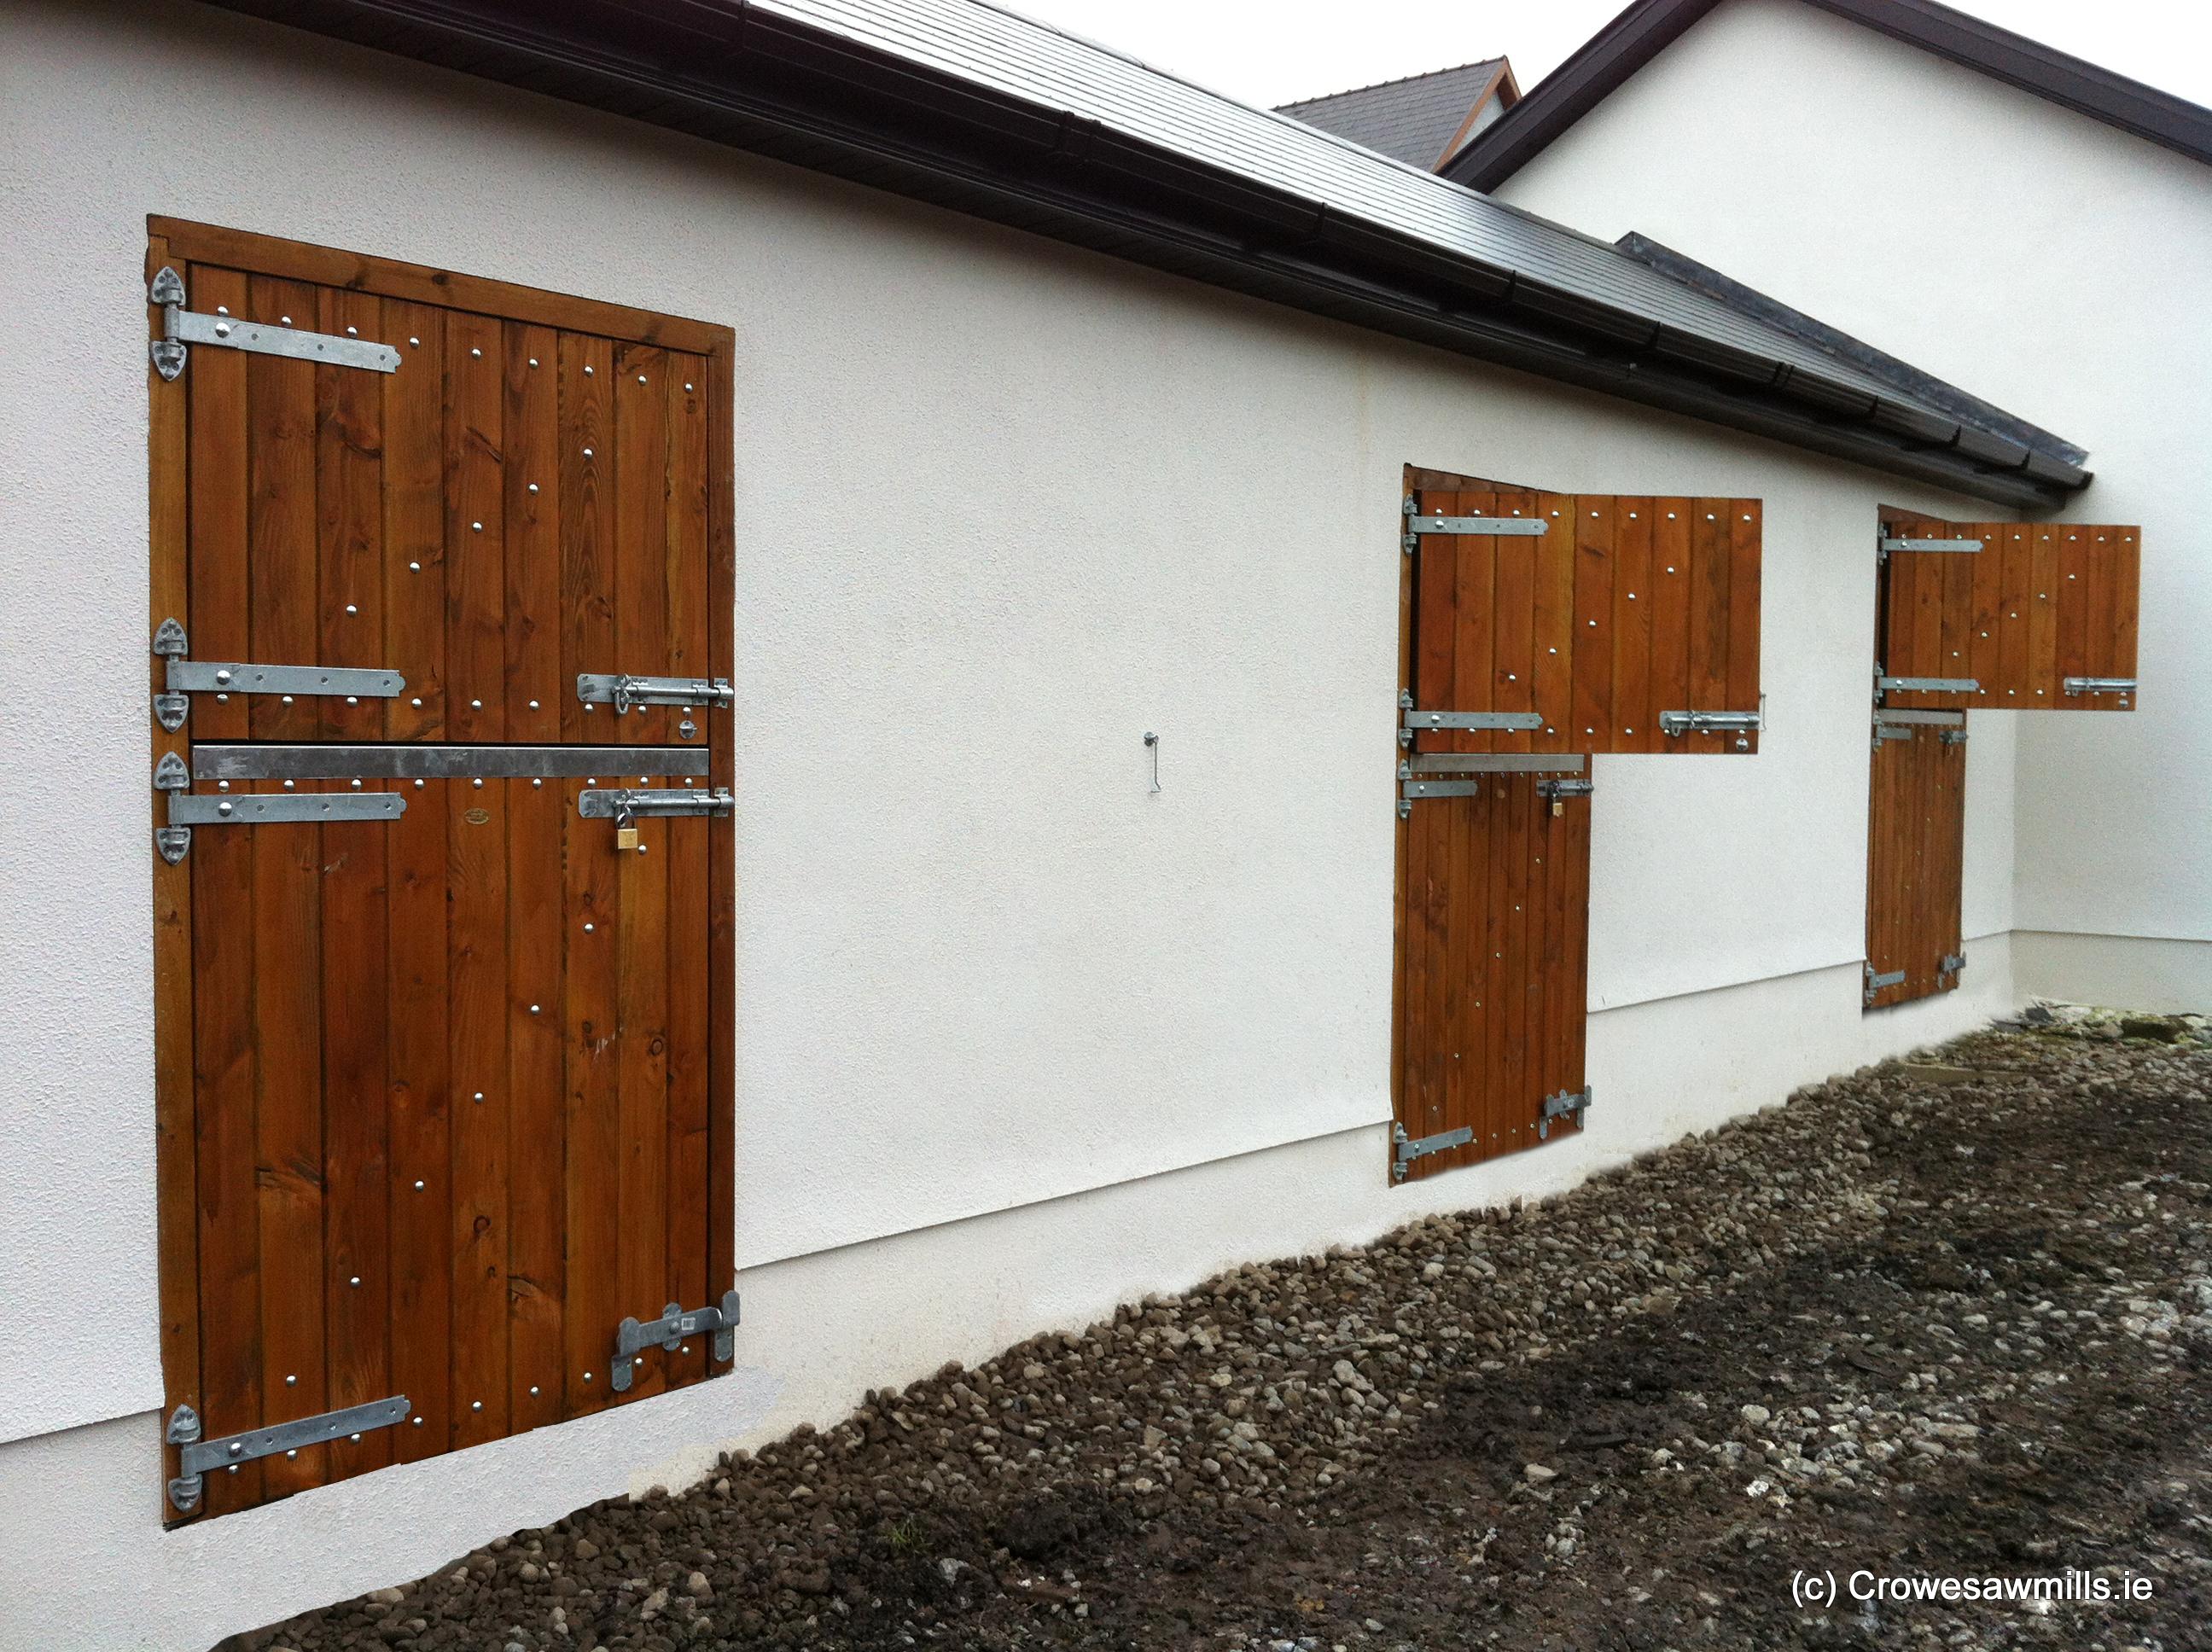 Douglas Fir Timber Stable Doors